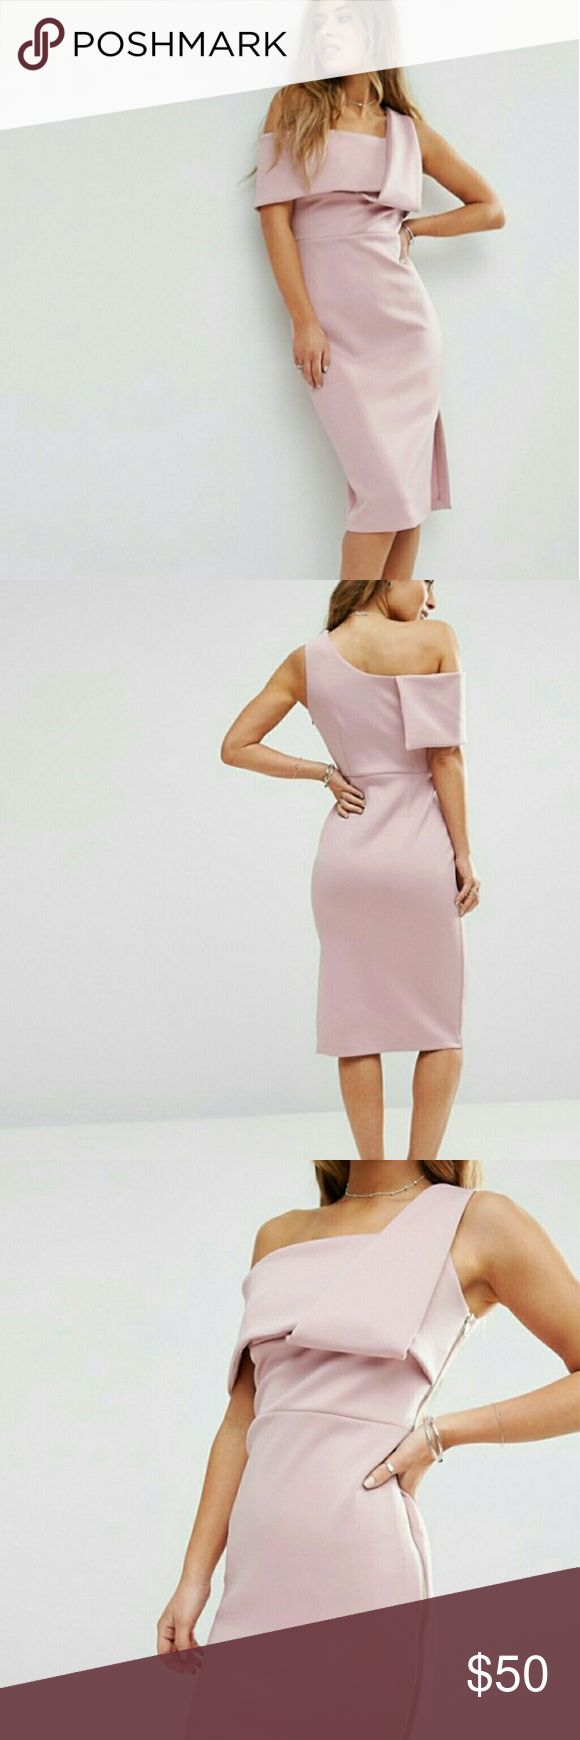 ASOS Petite One Shoulder Fold Scuba Dress Mauve/Blush one shoulder semiformal dress UK12 US10 ASOS Petite Dresses One Shoulder